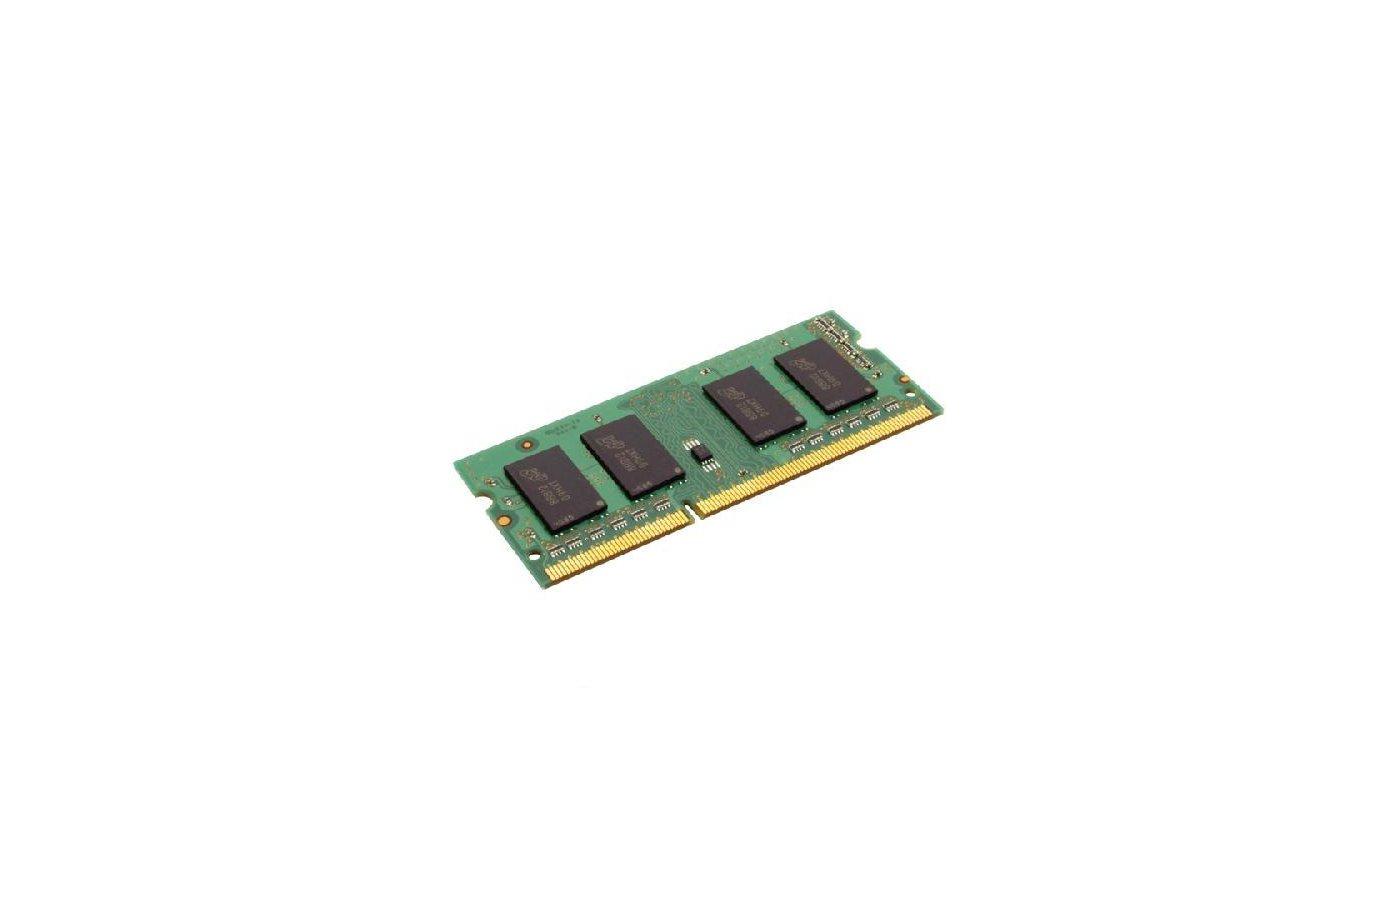 Оперативная память Patriot PSD34G133381S RTL PC3-10600 DDR3 4Gb 1333MHz CL9 SO-DIMM